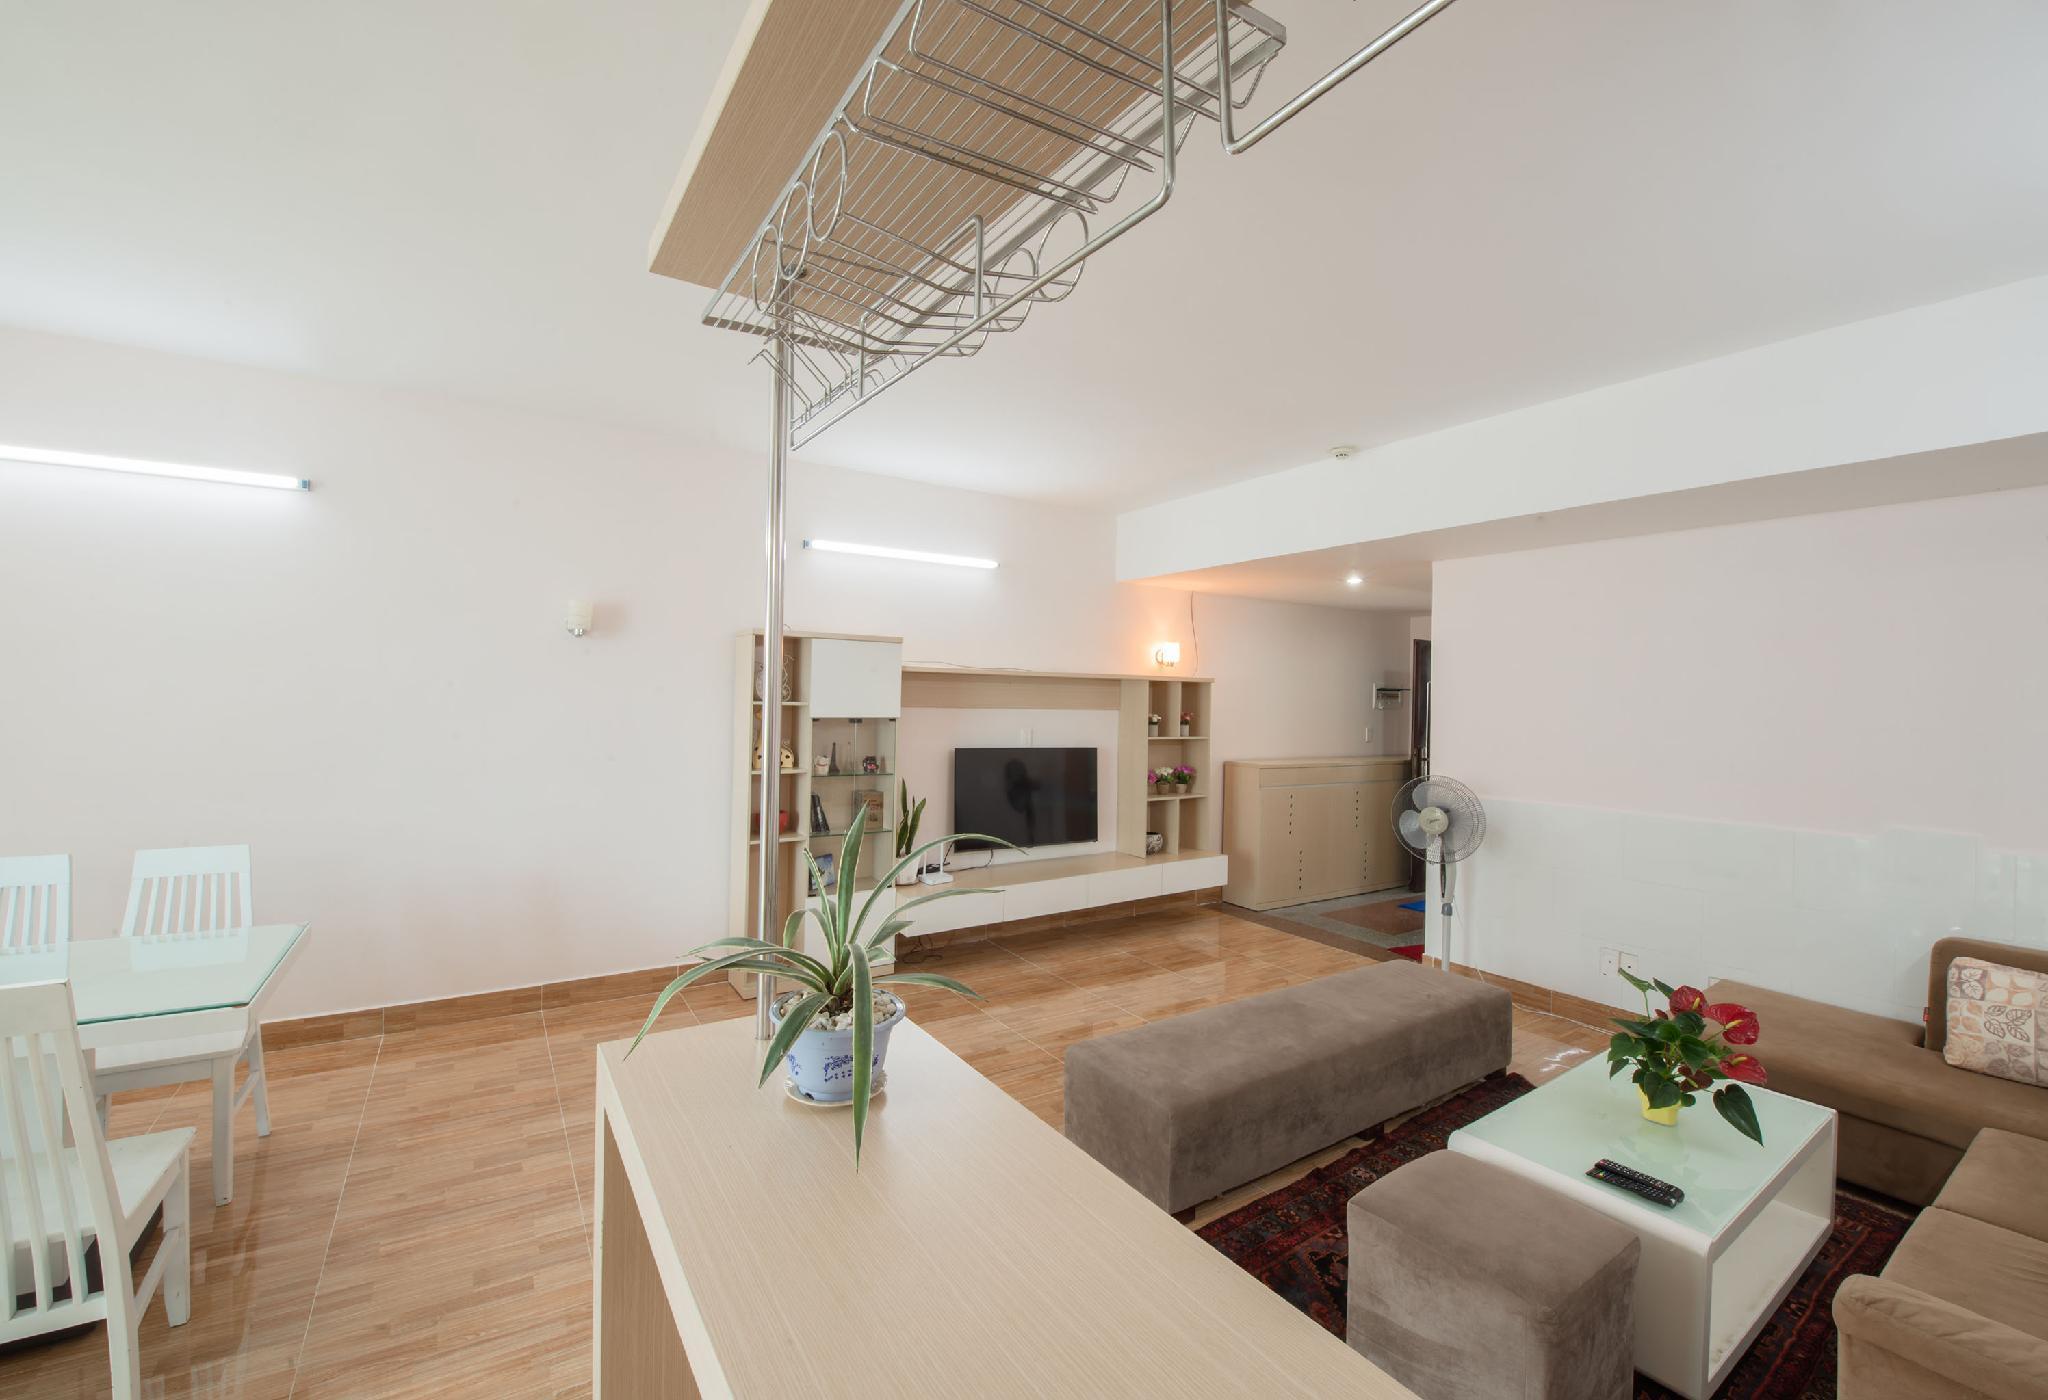 4 Bedrooms  Uplaza Apartment 160m2  Balcony 7.06